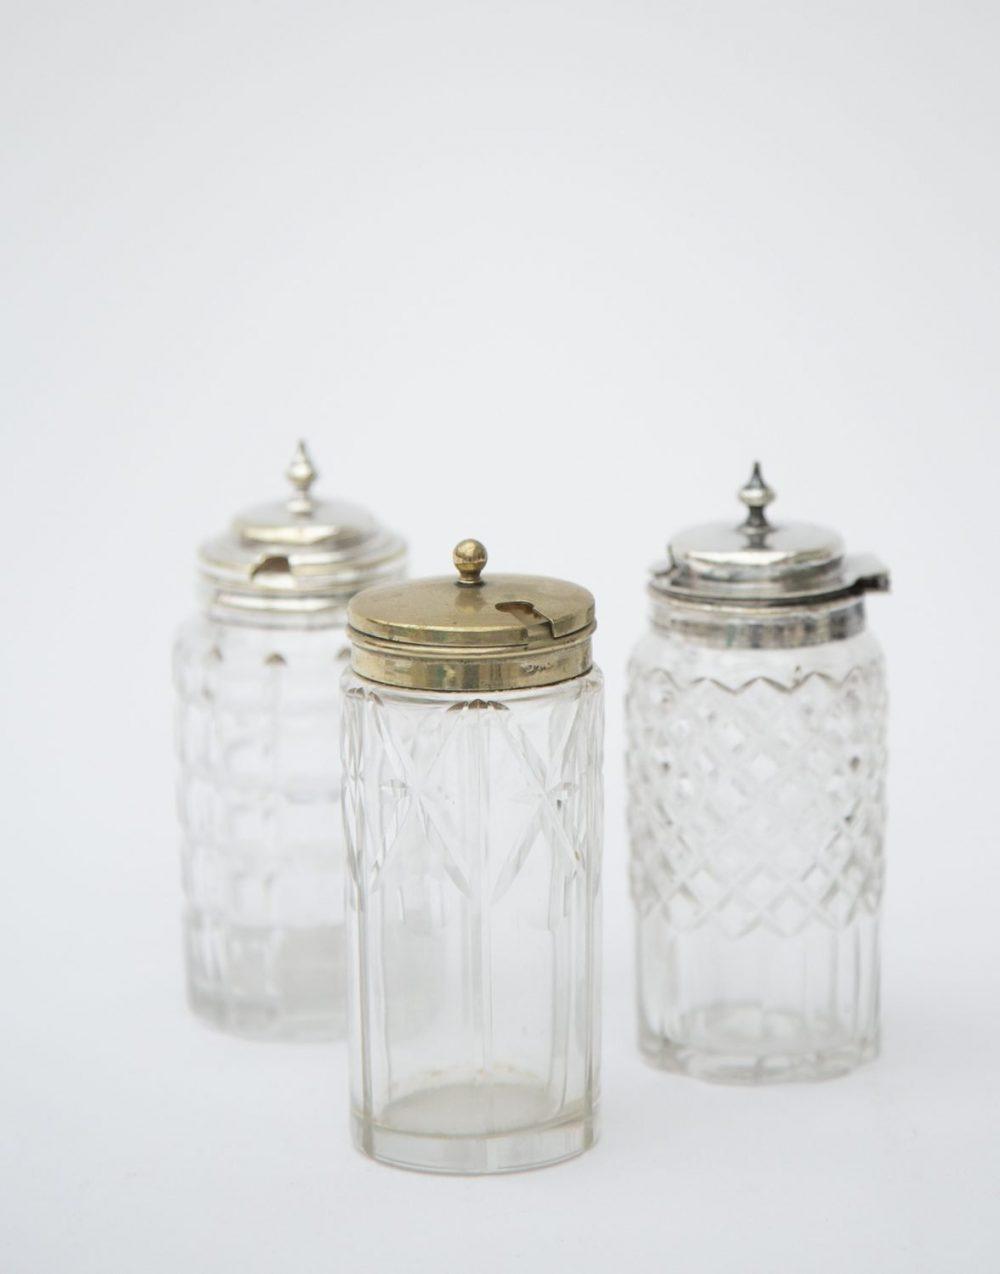 Vintage glass mustards